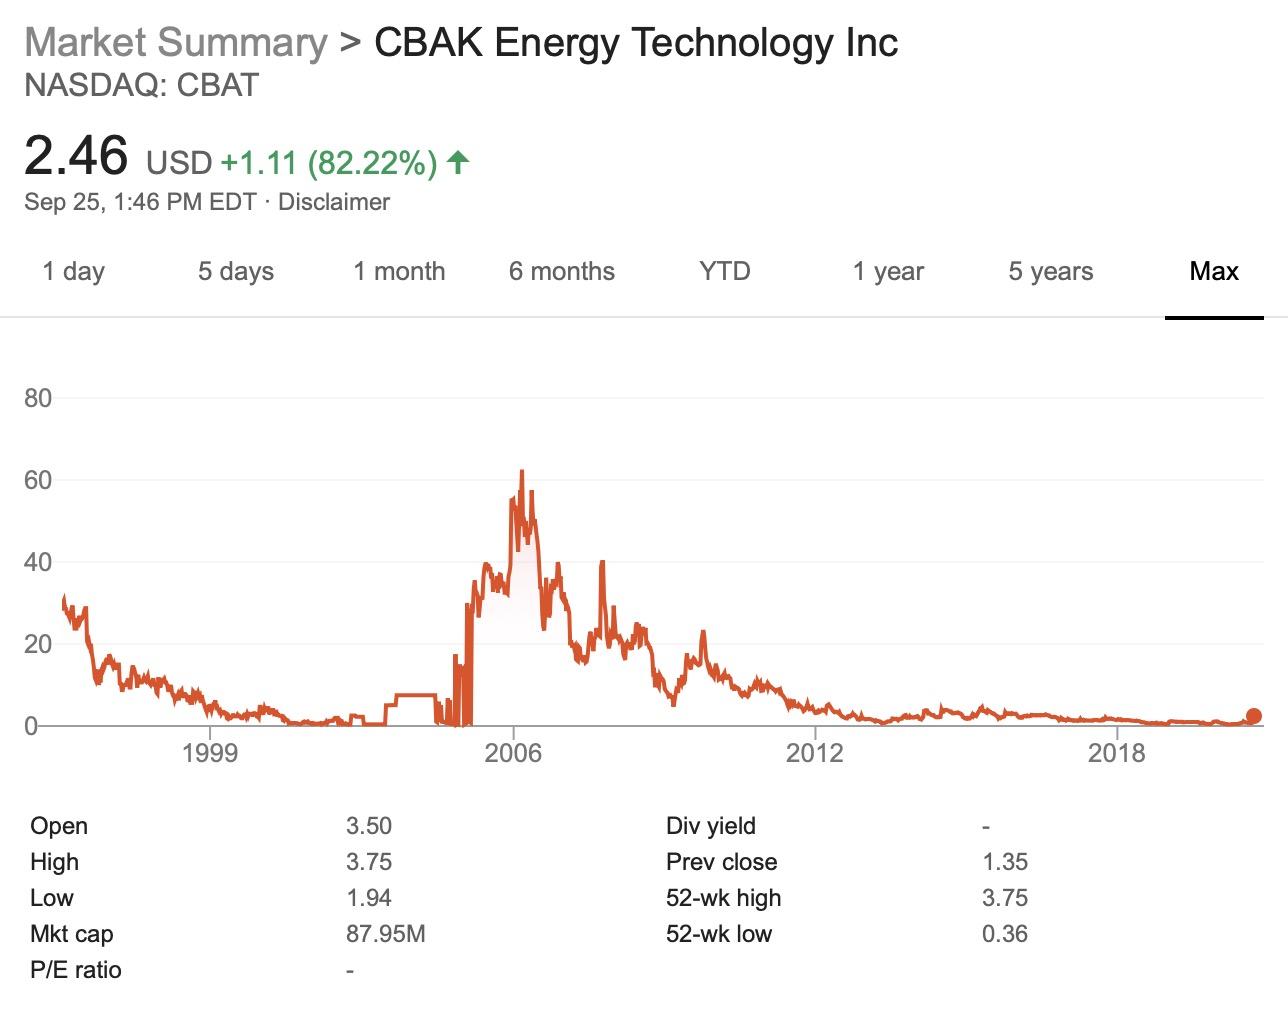 CBAK Energy Stock Performance